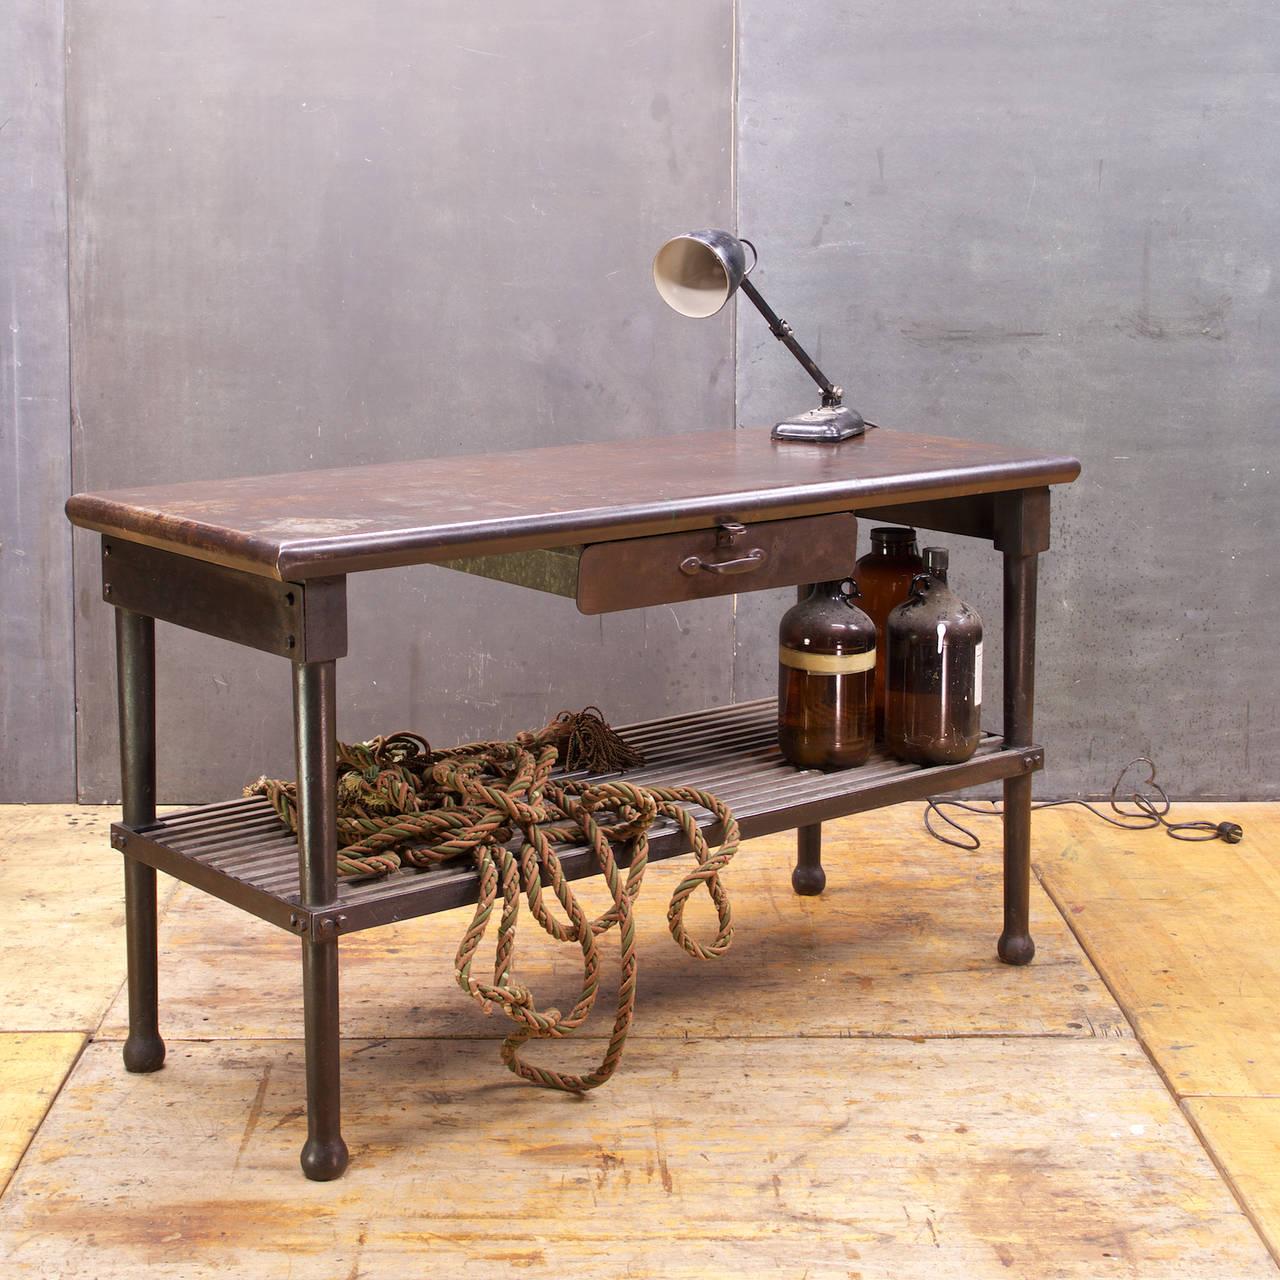 Farm House Industrial Era Kitchen Worktable Bohemian Dark Iron Wood Slat Kitchen For Sale At 1stdibs